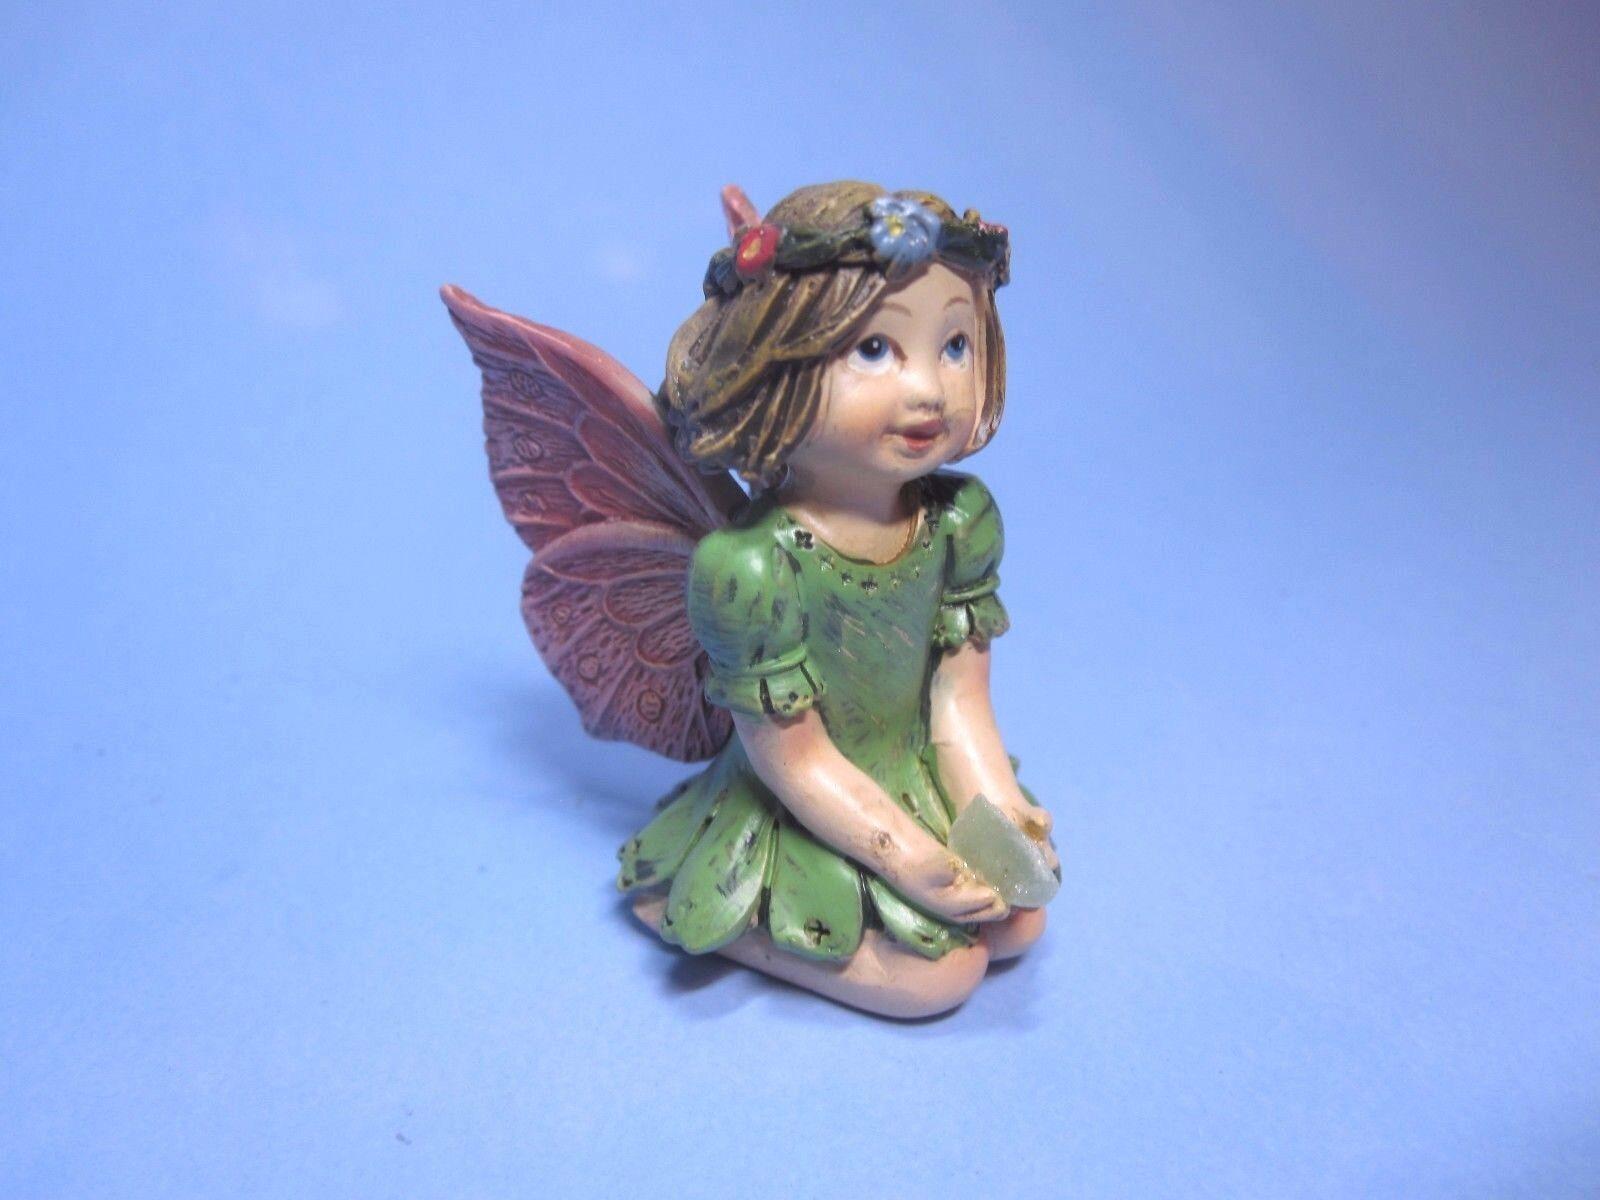 Miniature Dollhouse Garden Fairy With A Gem ~ Green Figurine Statue Decor